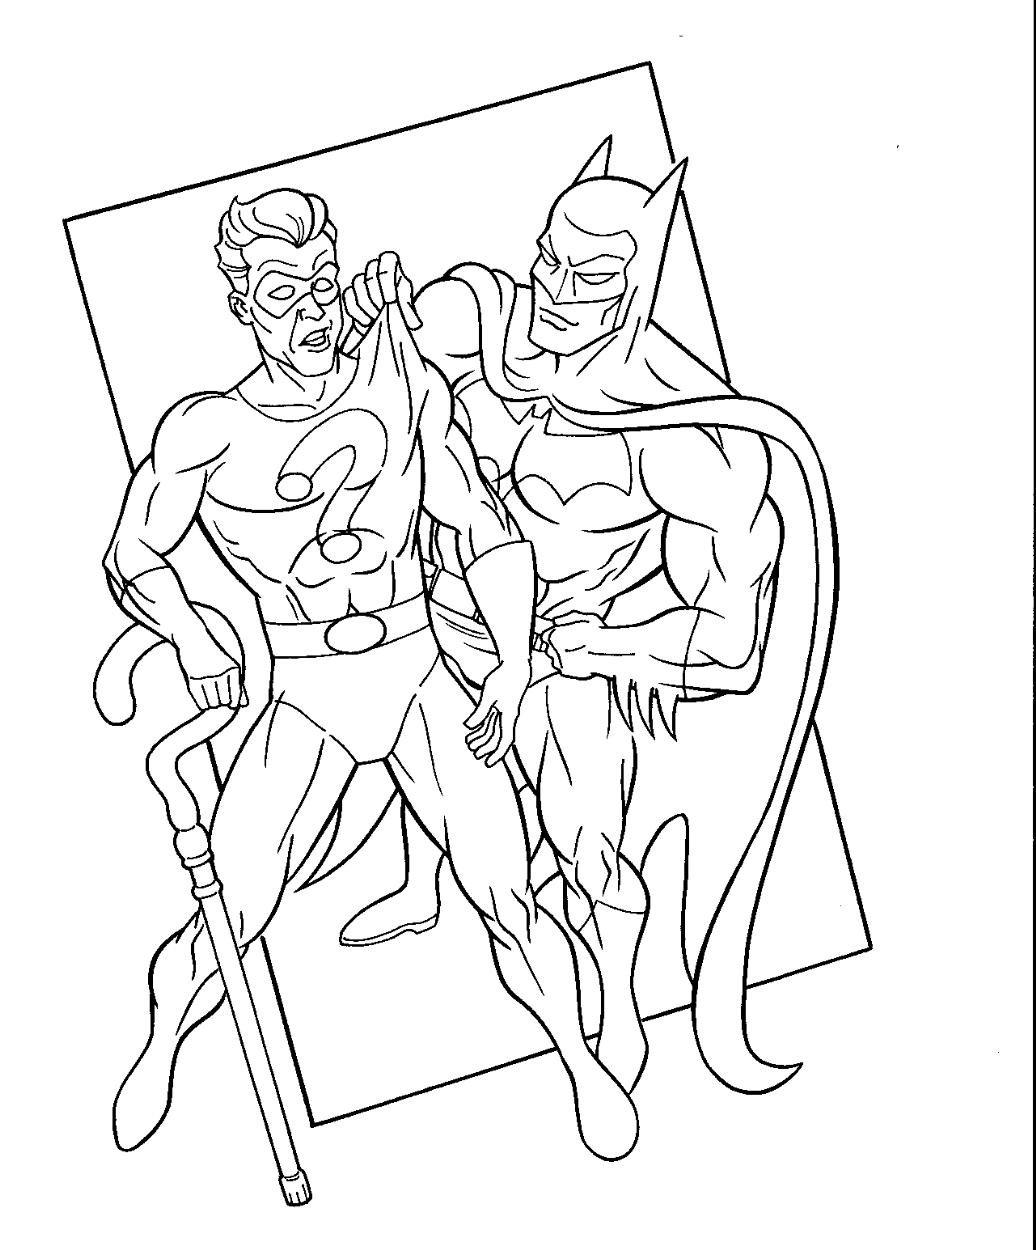 Batman Riddler In The Batfan S Batman Coloring Book Pages 3 Comic Art Gallery Room